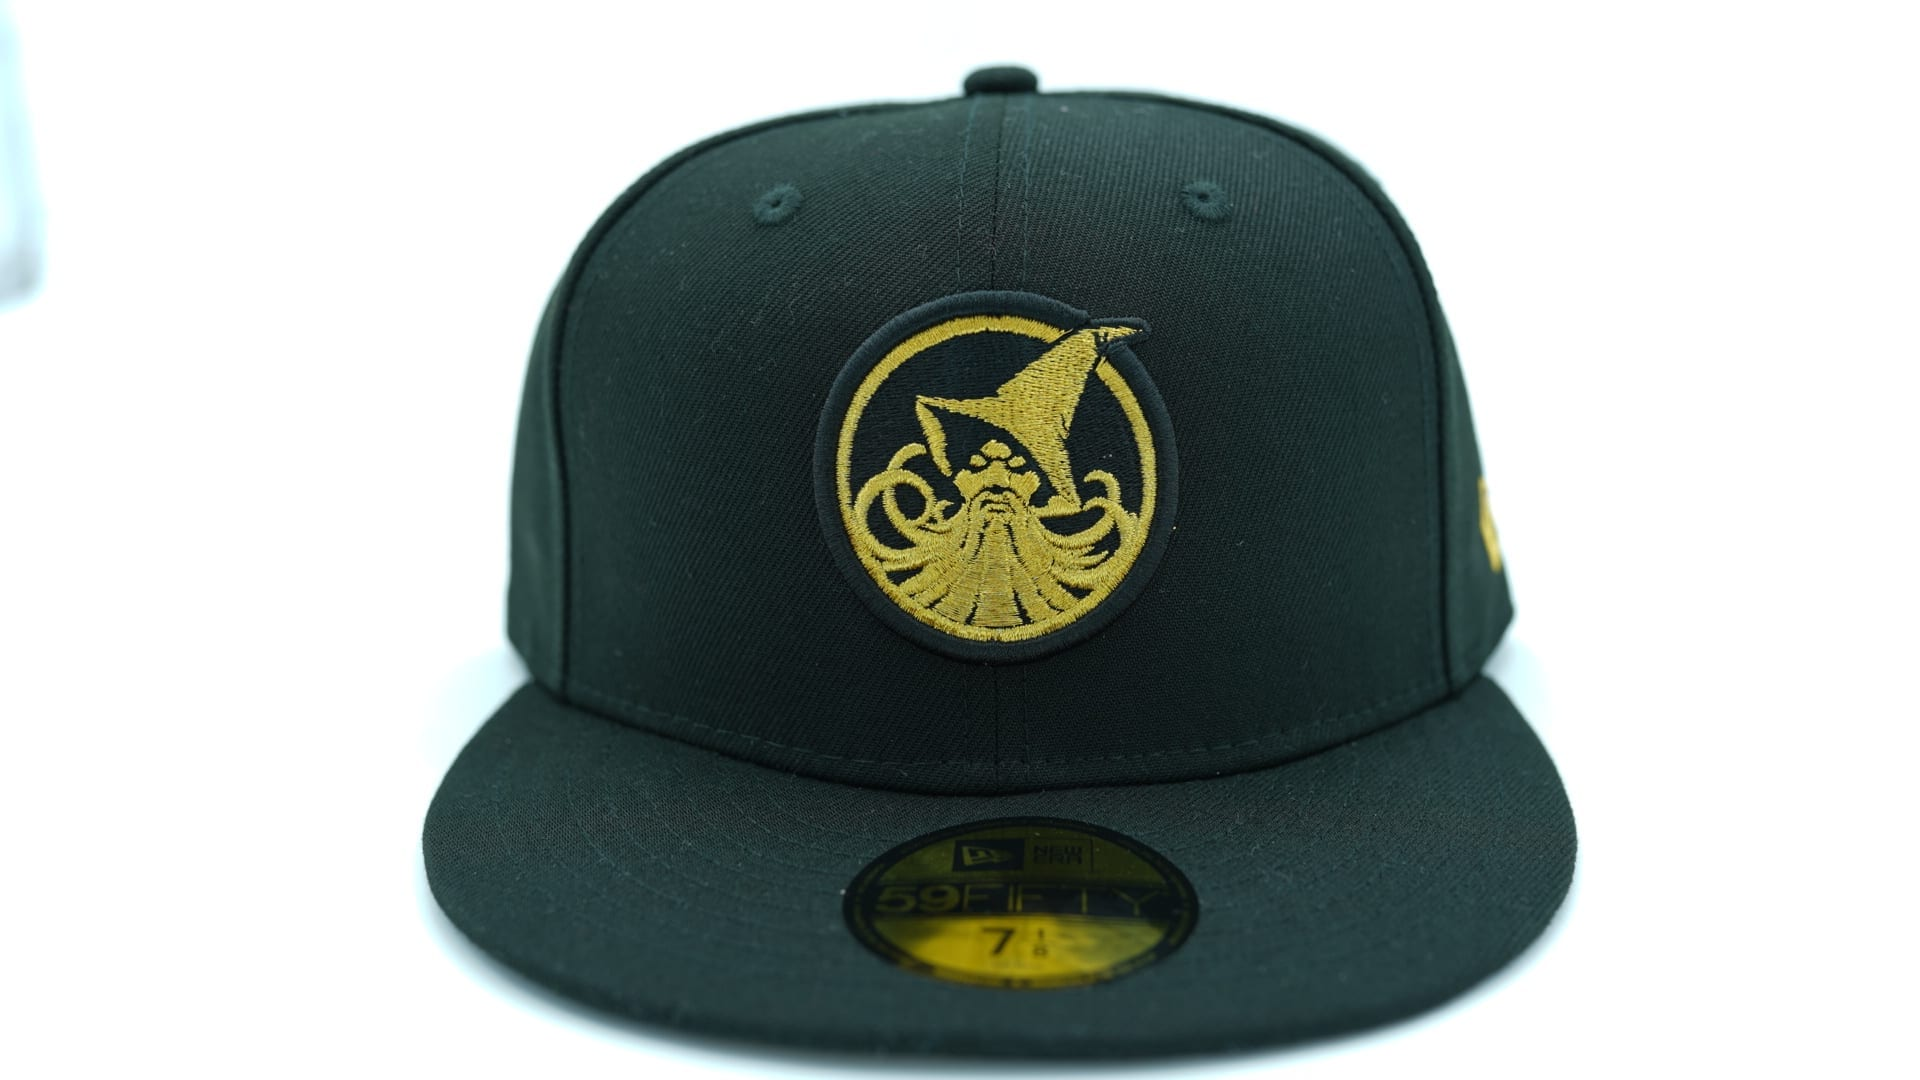 HOPPY x NEW ERA Logo 59Fifty Fitted Baseball Cap